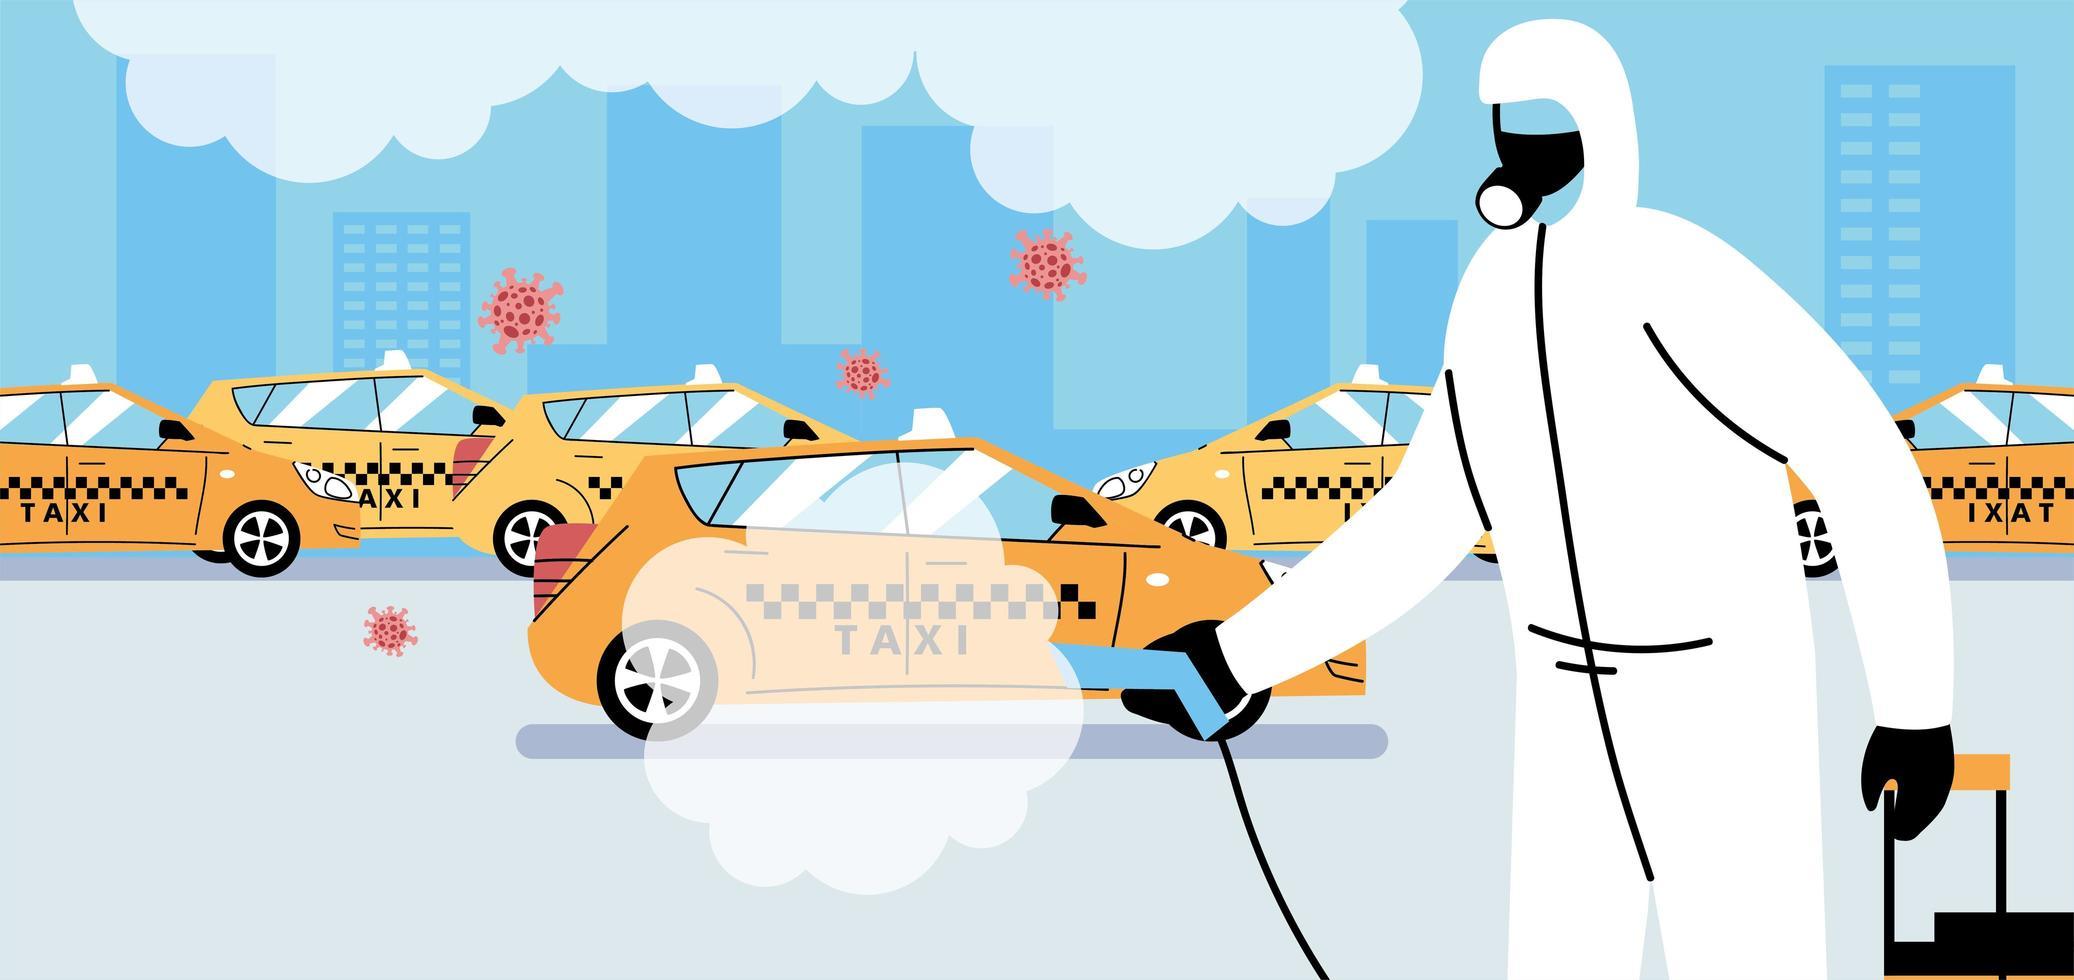 Service Taxi Desinfektion von Coronavirus oder Covid 19 vektor